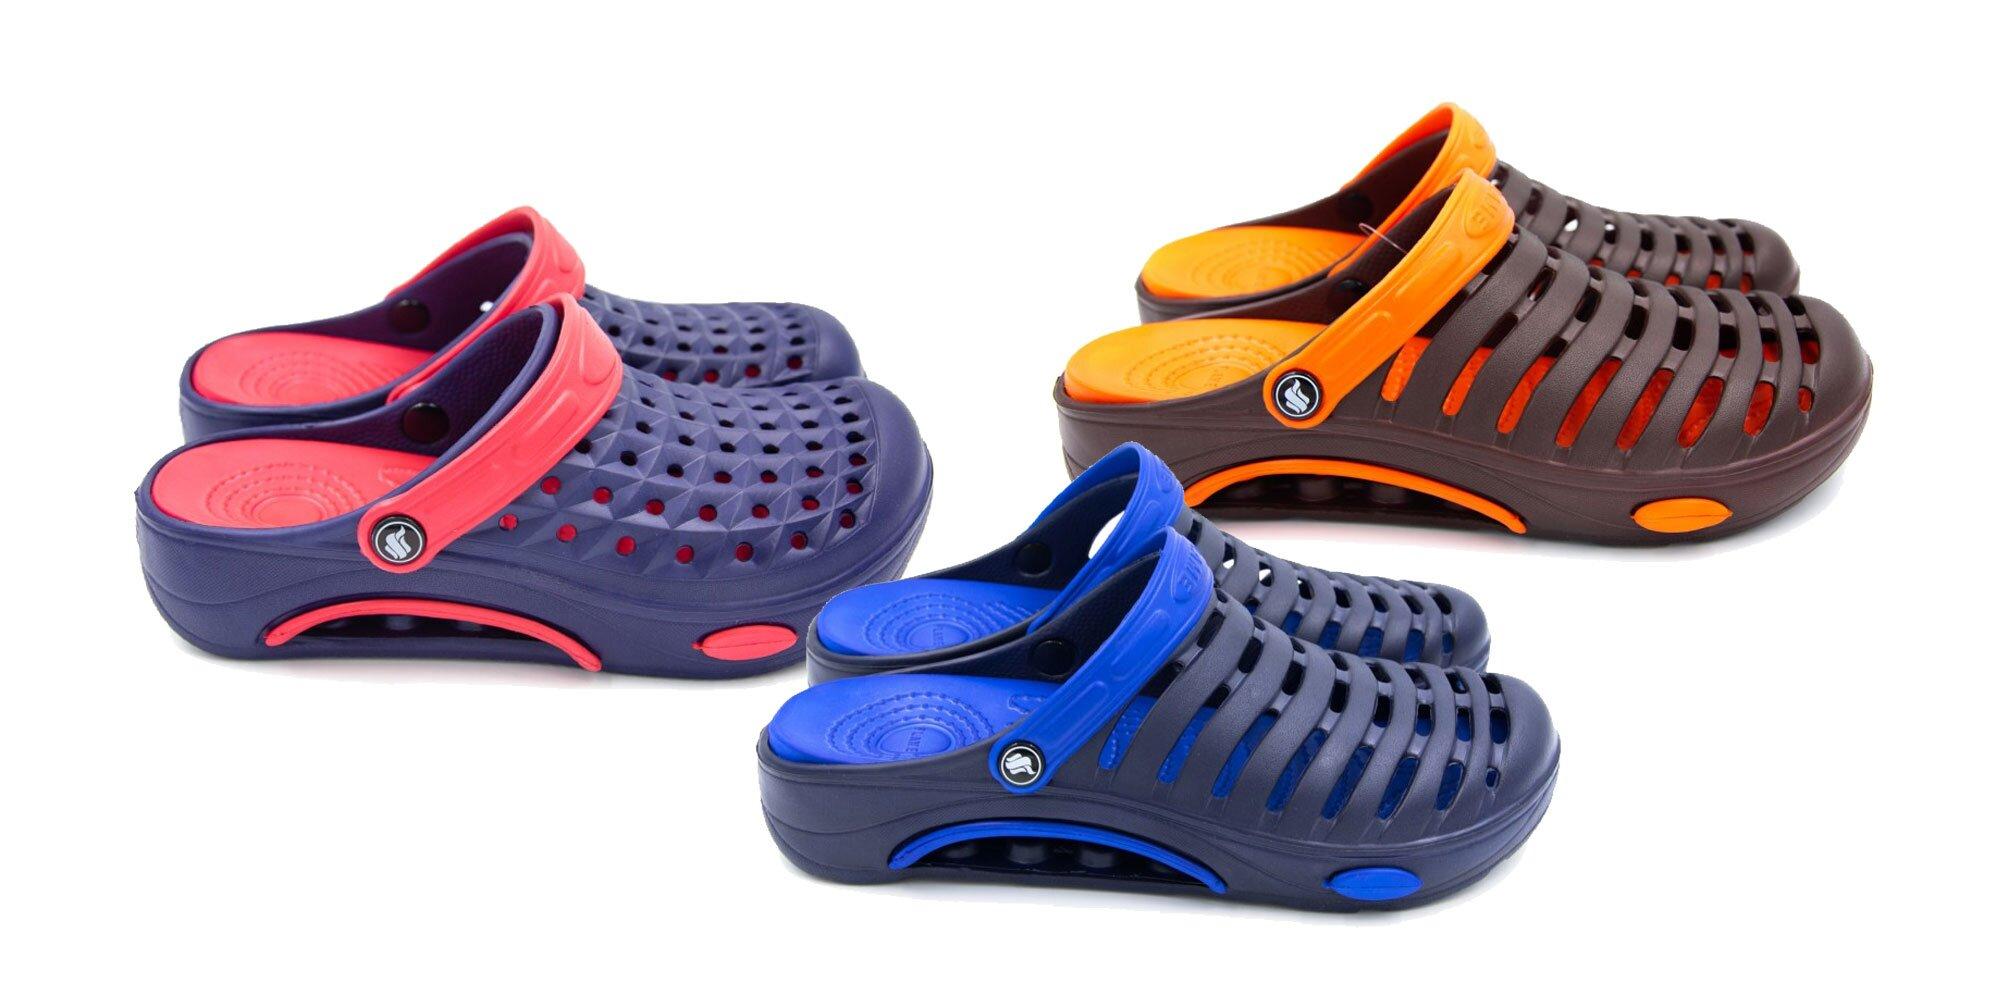 264e53b51b44 Topánky FLAMEshoes vyrobené na Slovensku